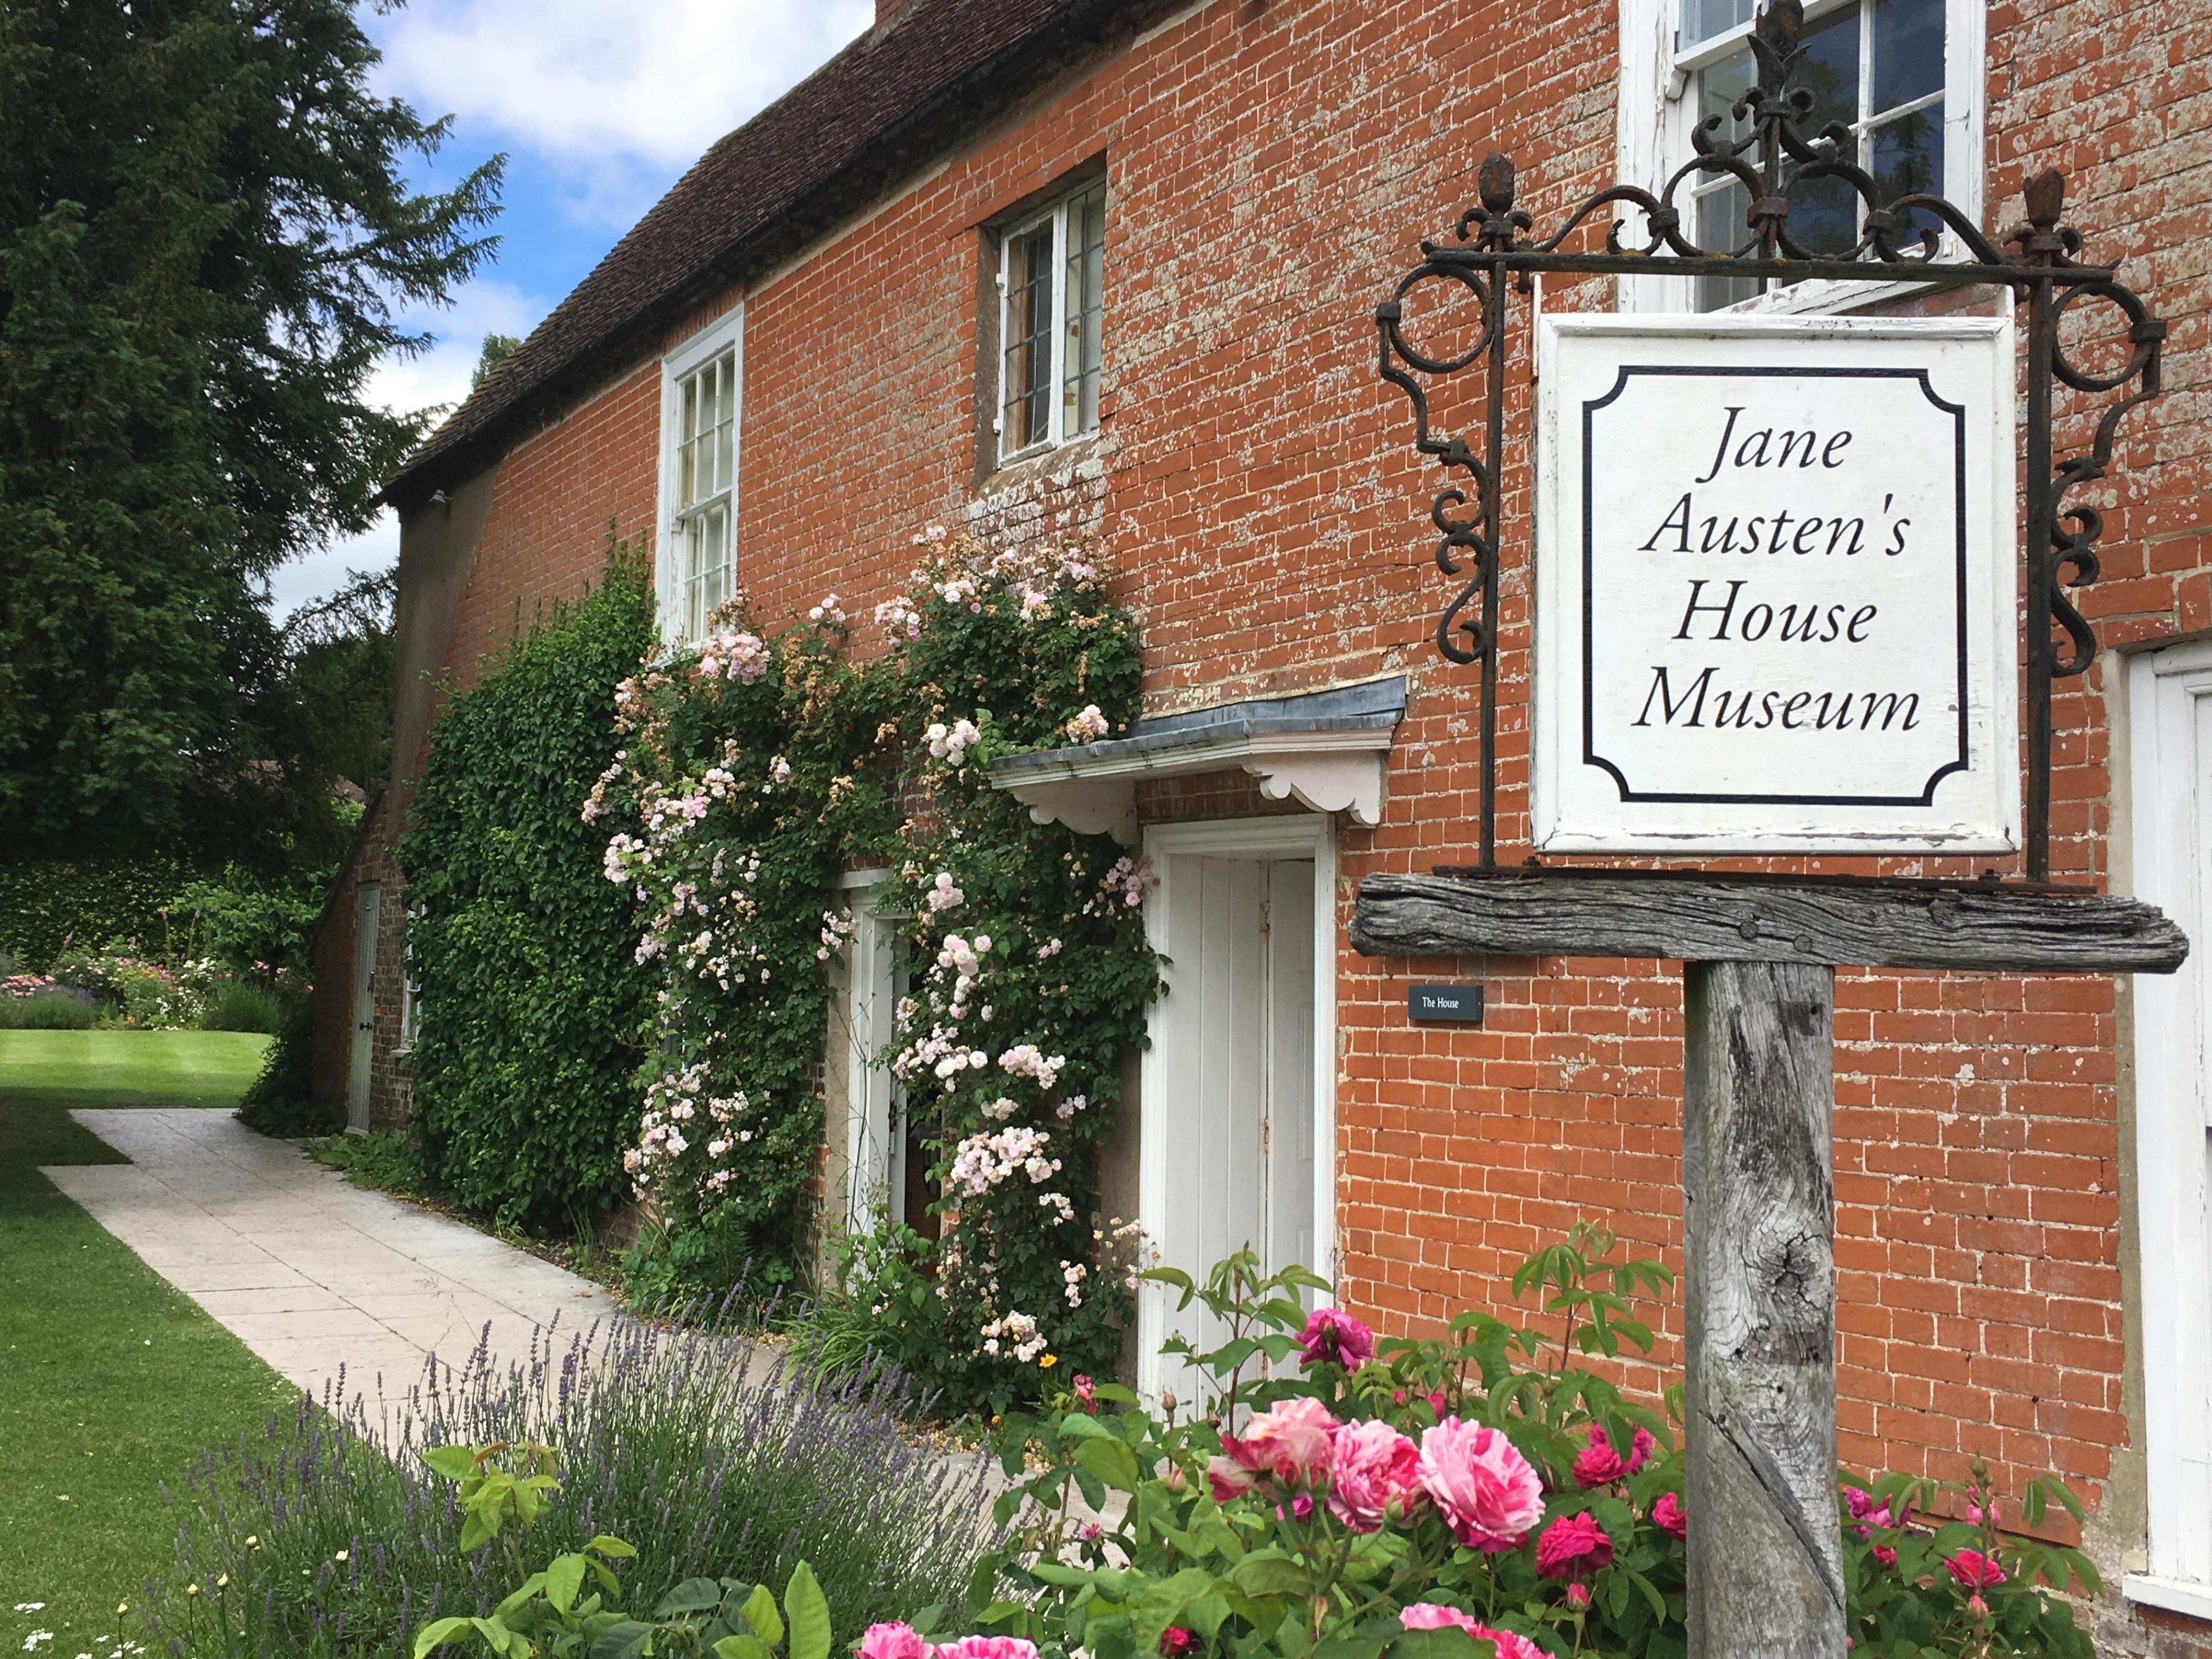 Jane Austen's House Museum, Alton, England, United Kingdom